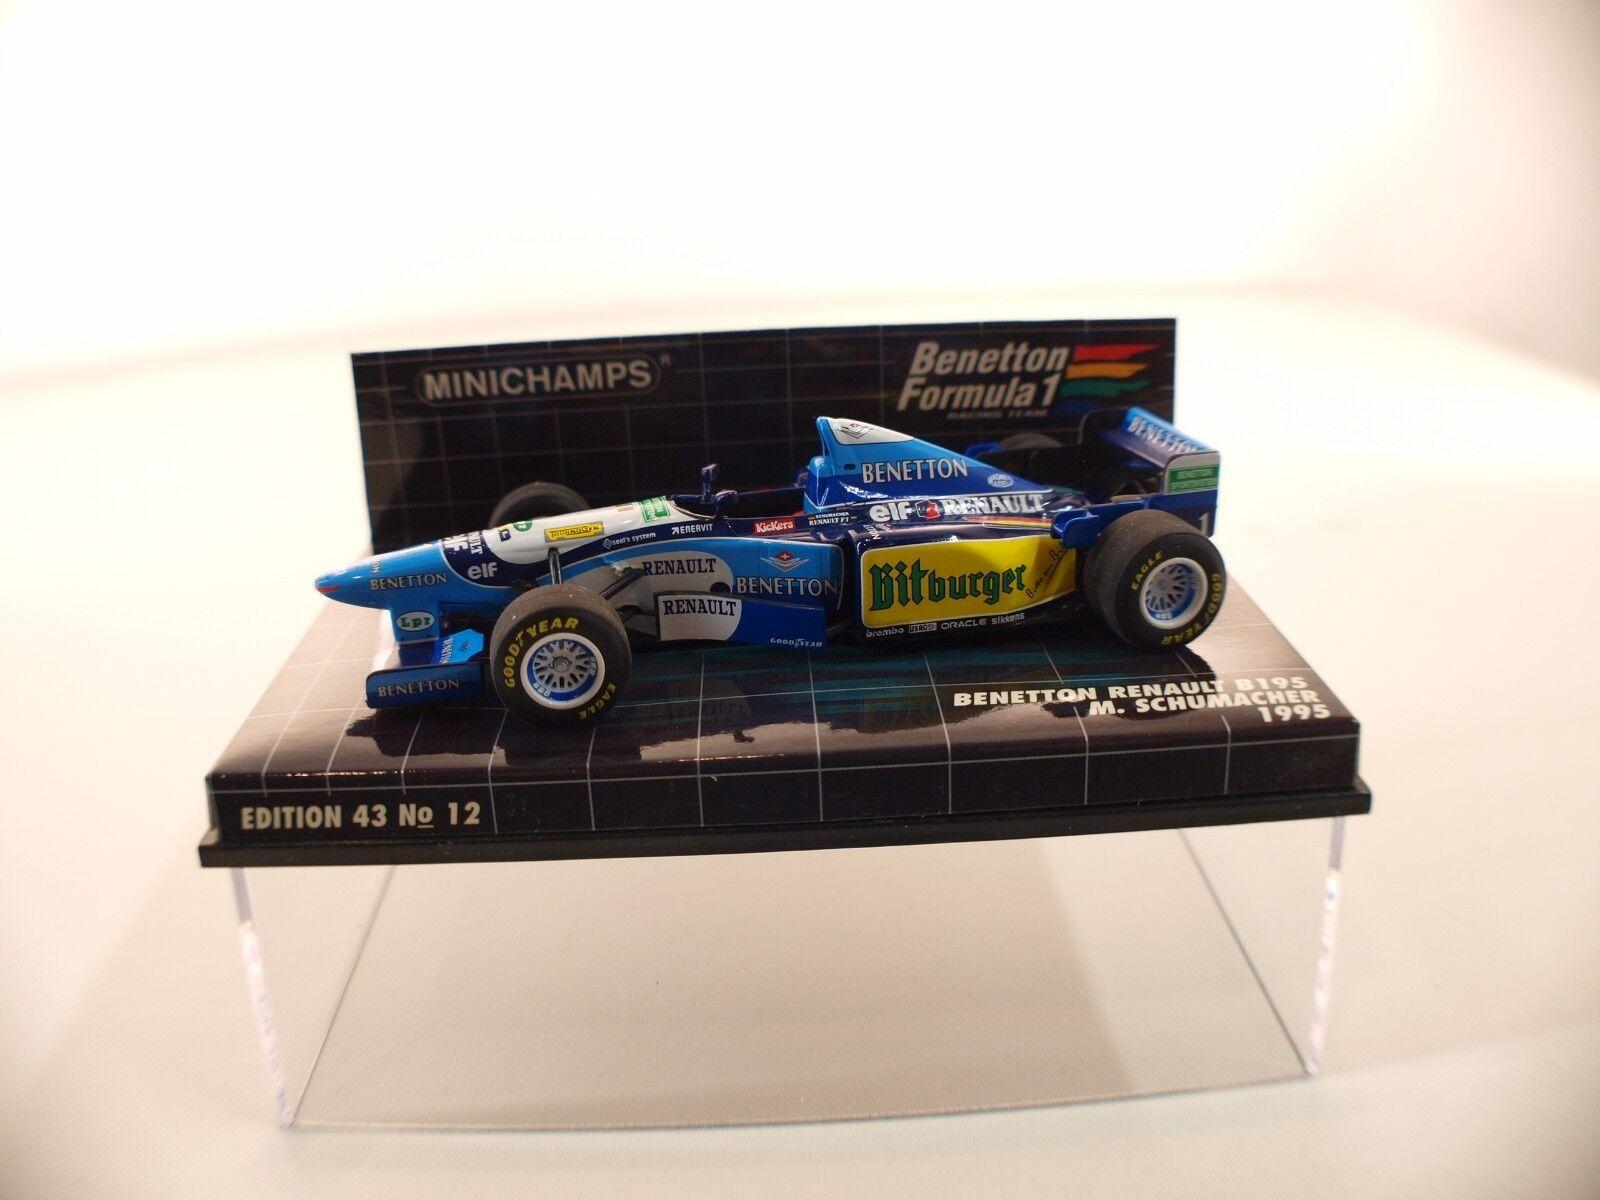 Minichamps Benetton B195 1995 Michael Schumacher 1 43 neuf boxed   en boîte